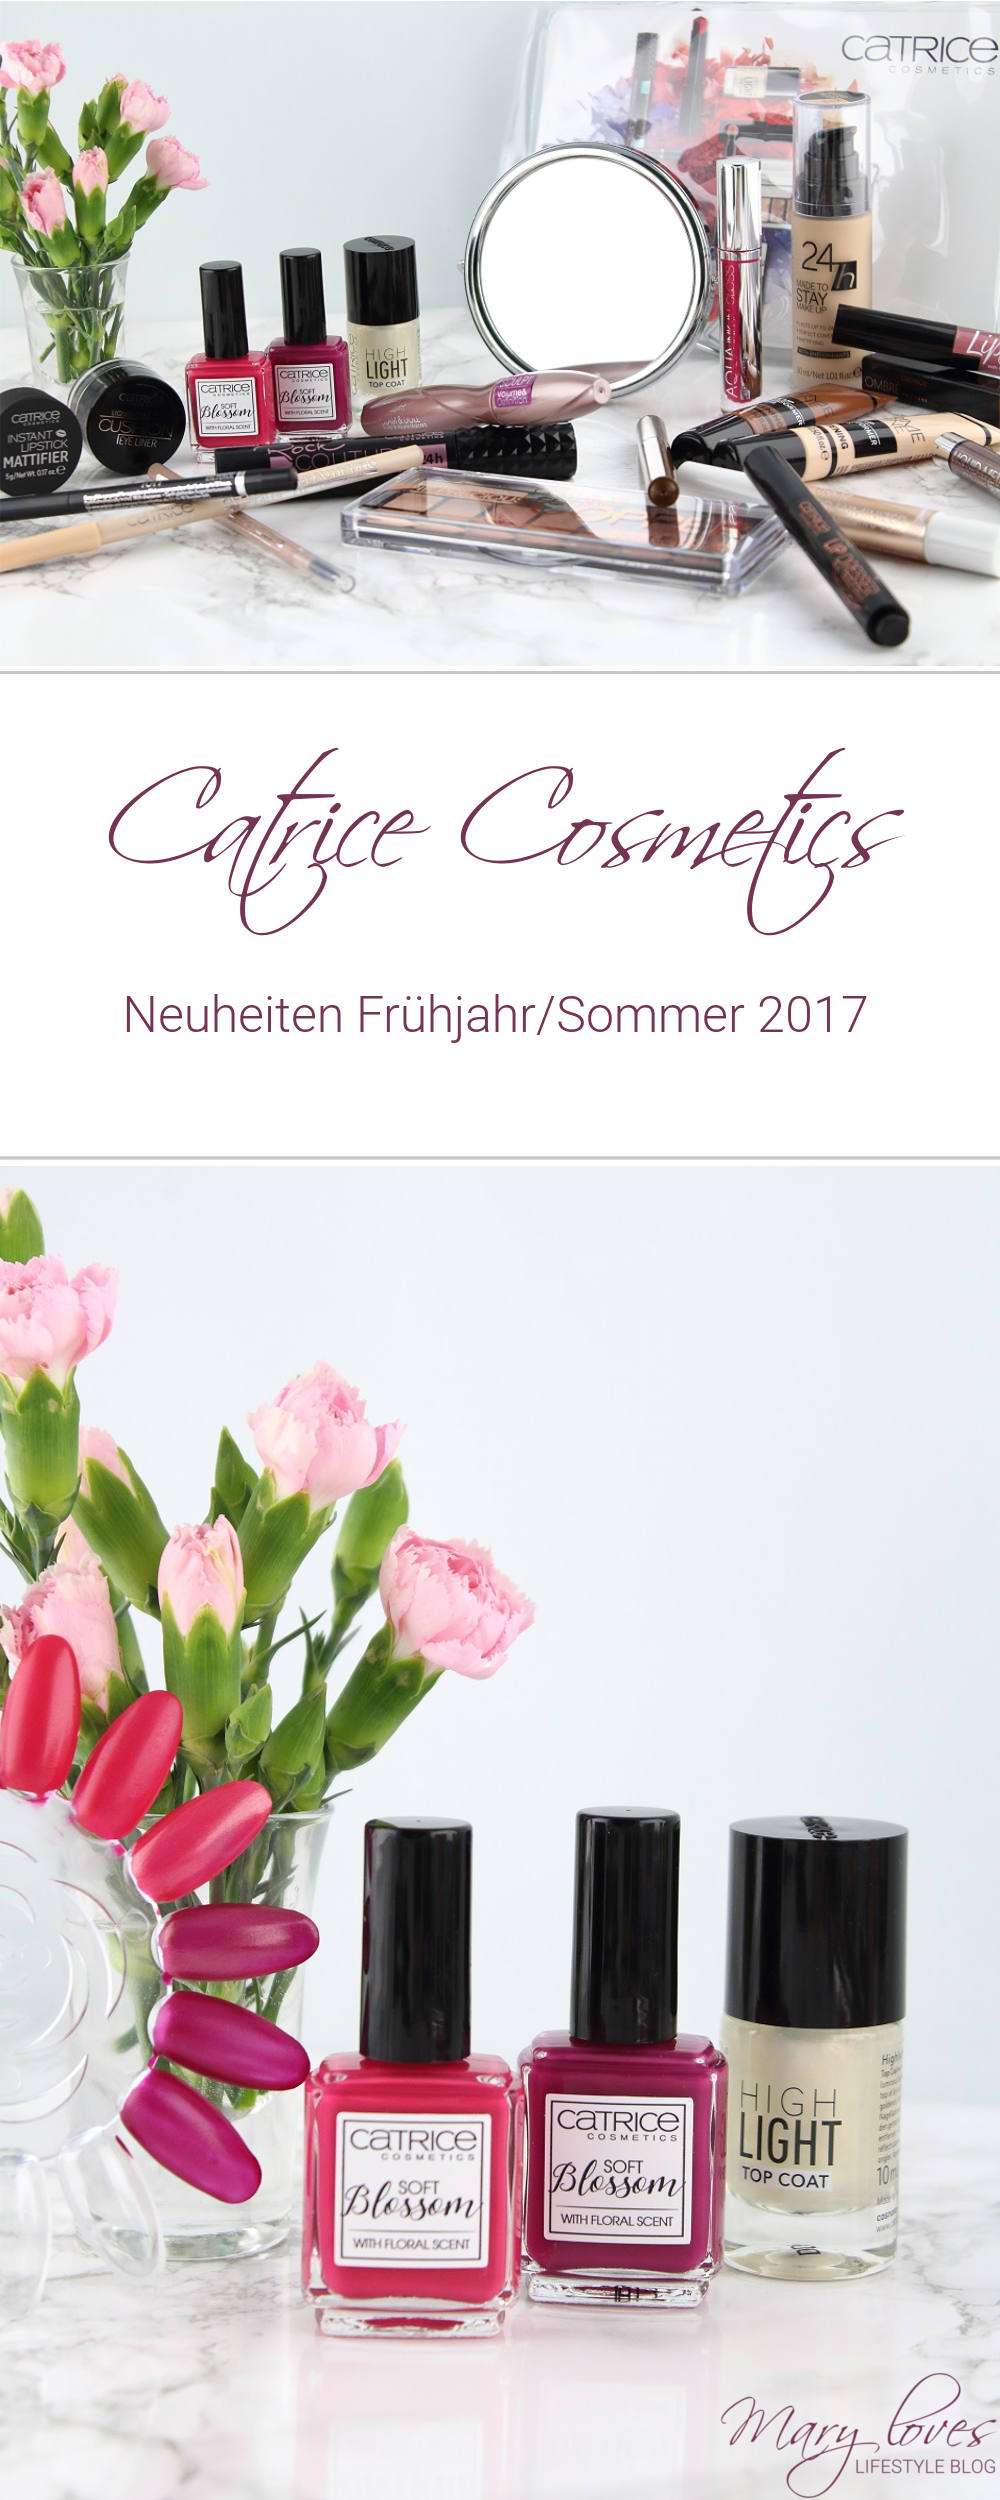 Catrice Neuheiten Frühjahr/Sommer 2017 - Sortimentsumstellung - Beauty - Make-up - Kosmetik